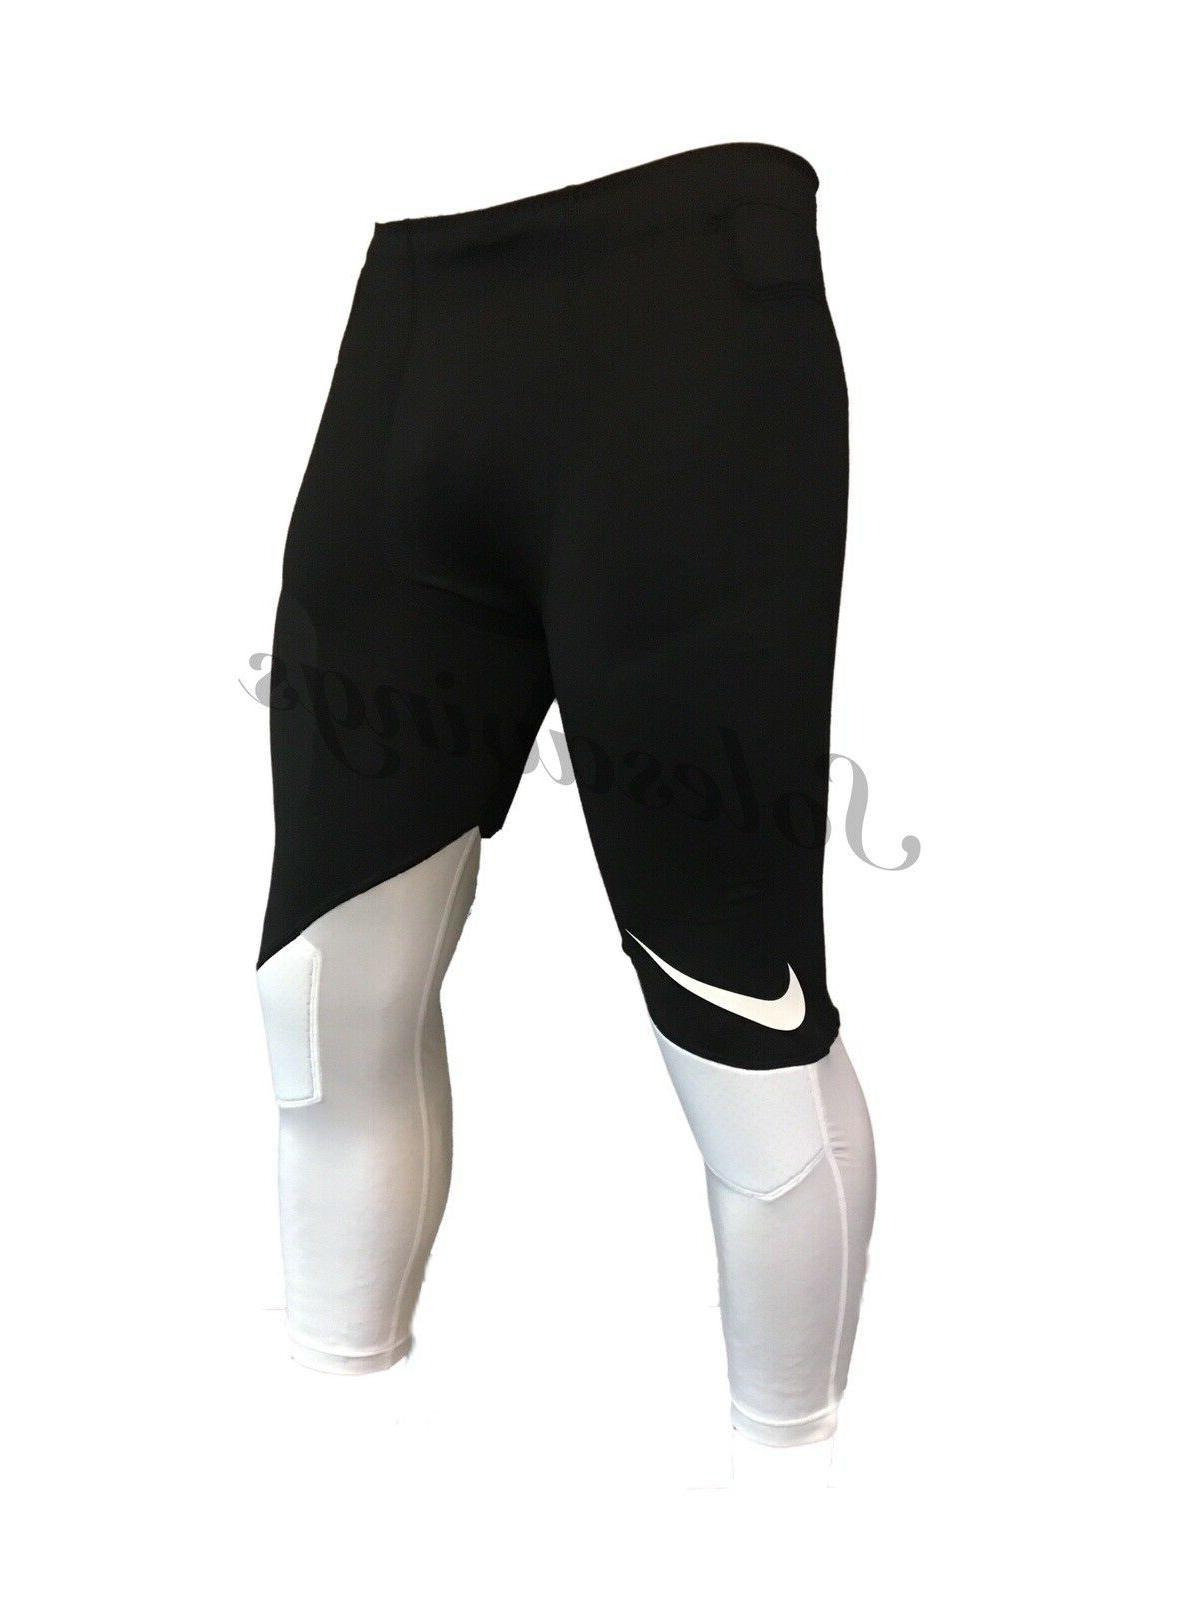 Nike Padded 3/4 Compression Flag